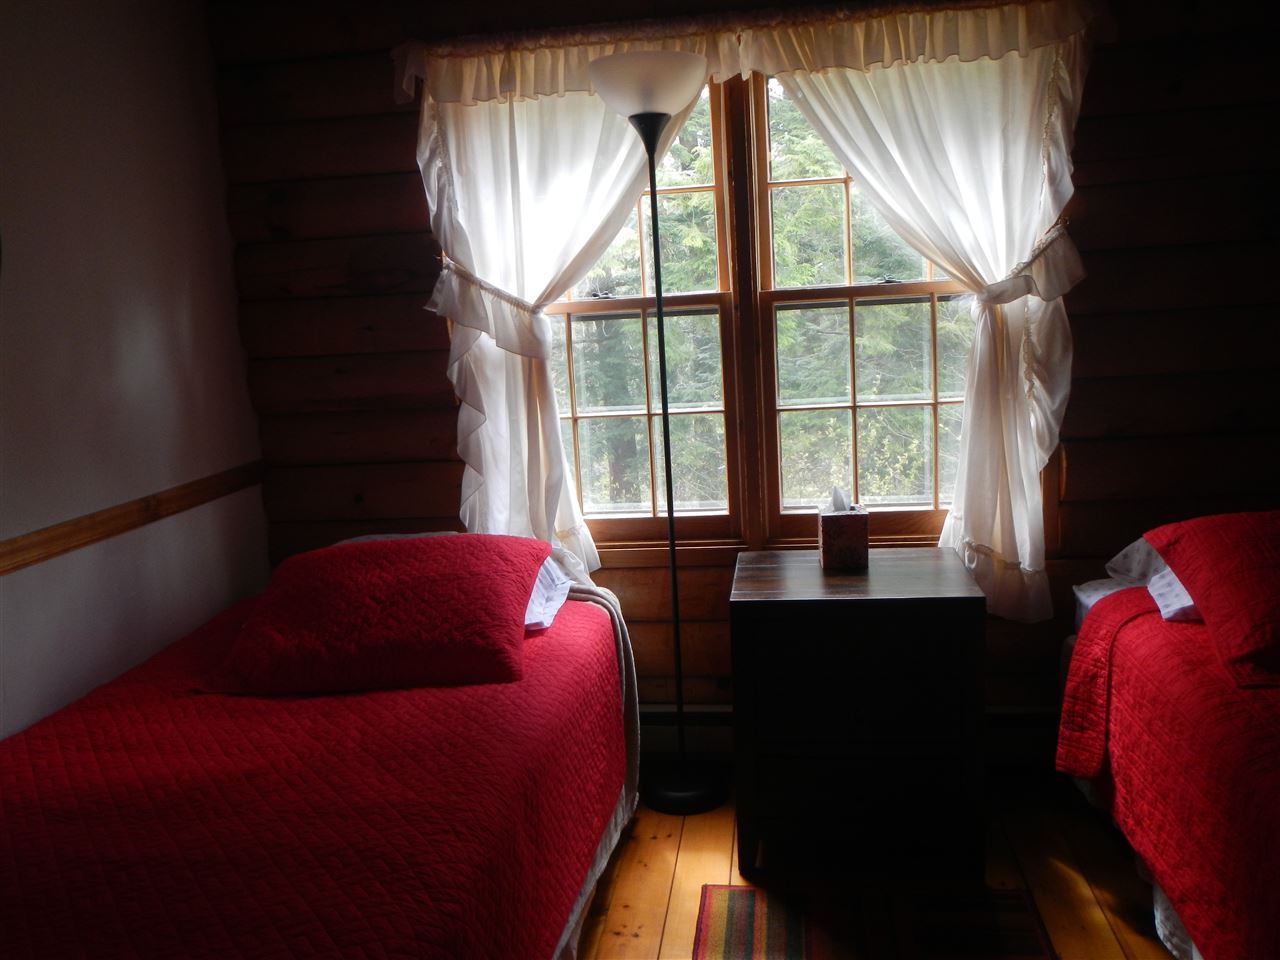 Mount-Snow-Real-Estate-4633923-12